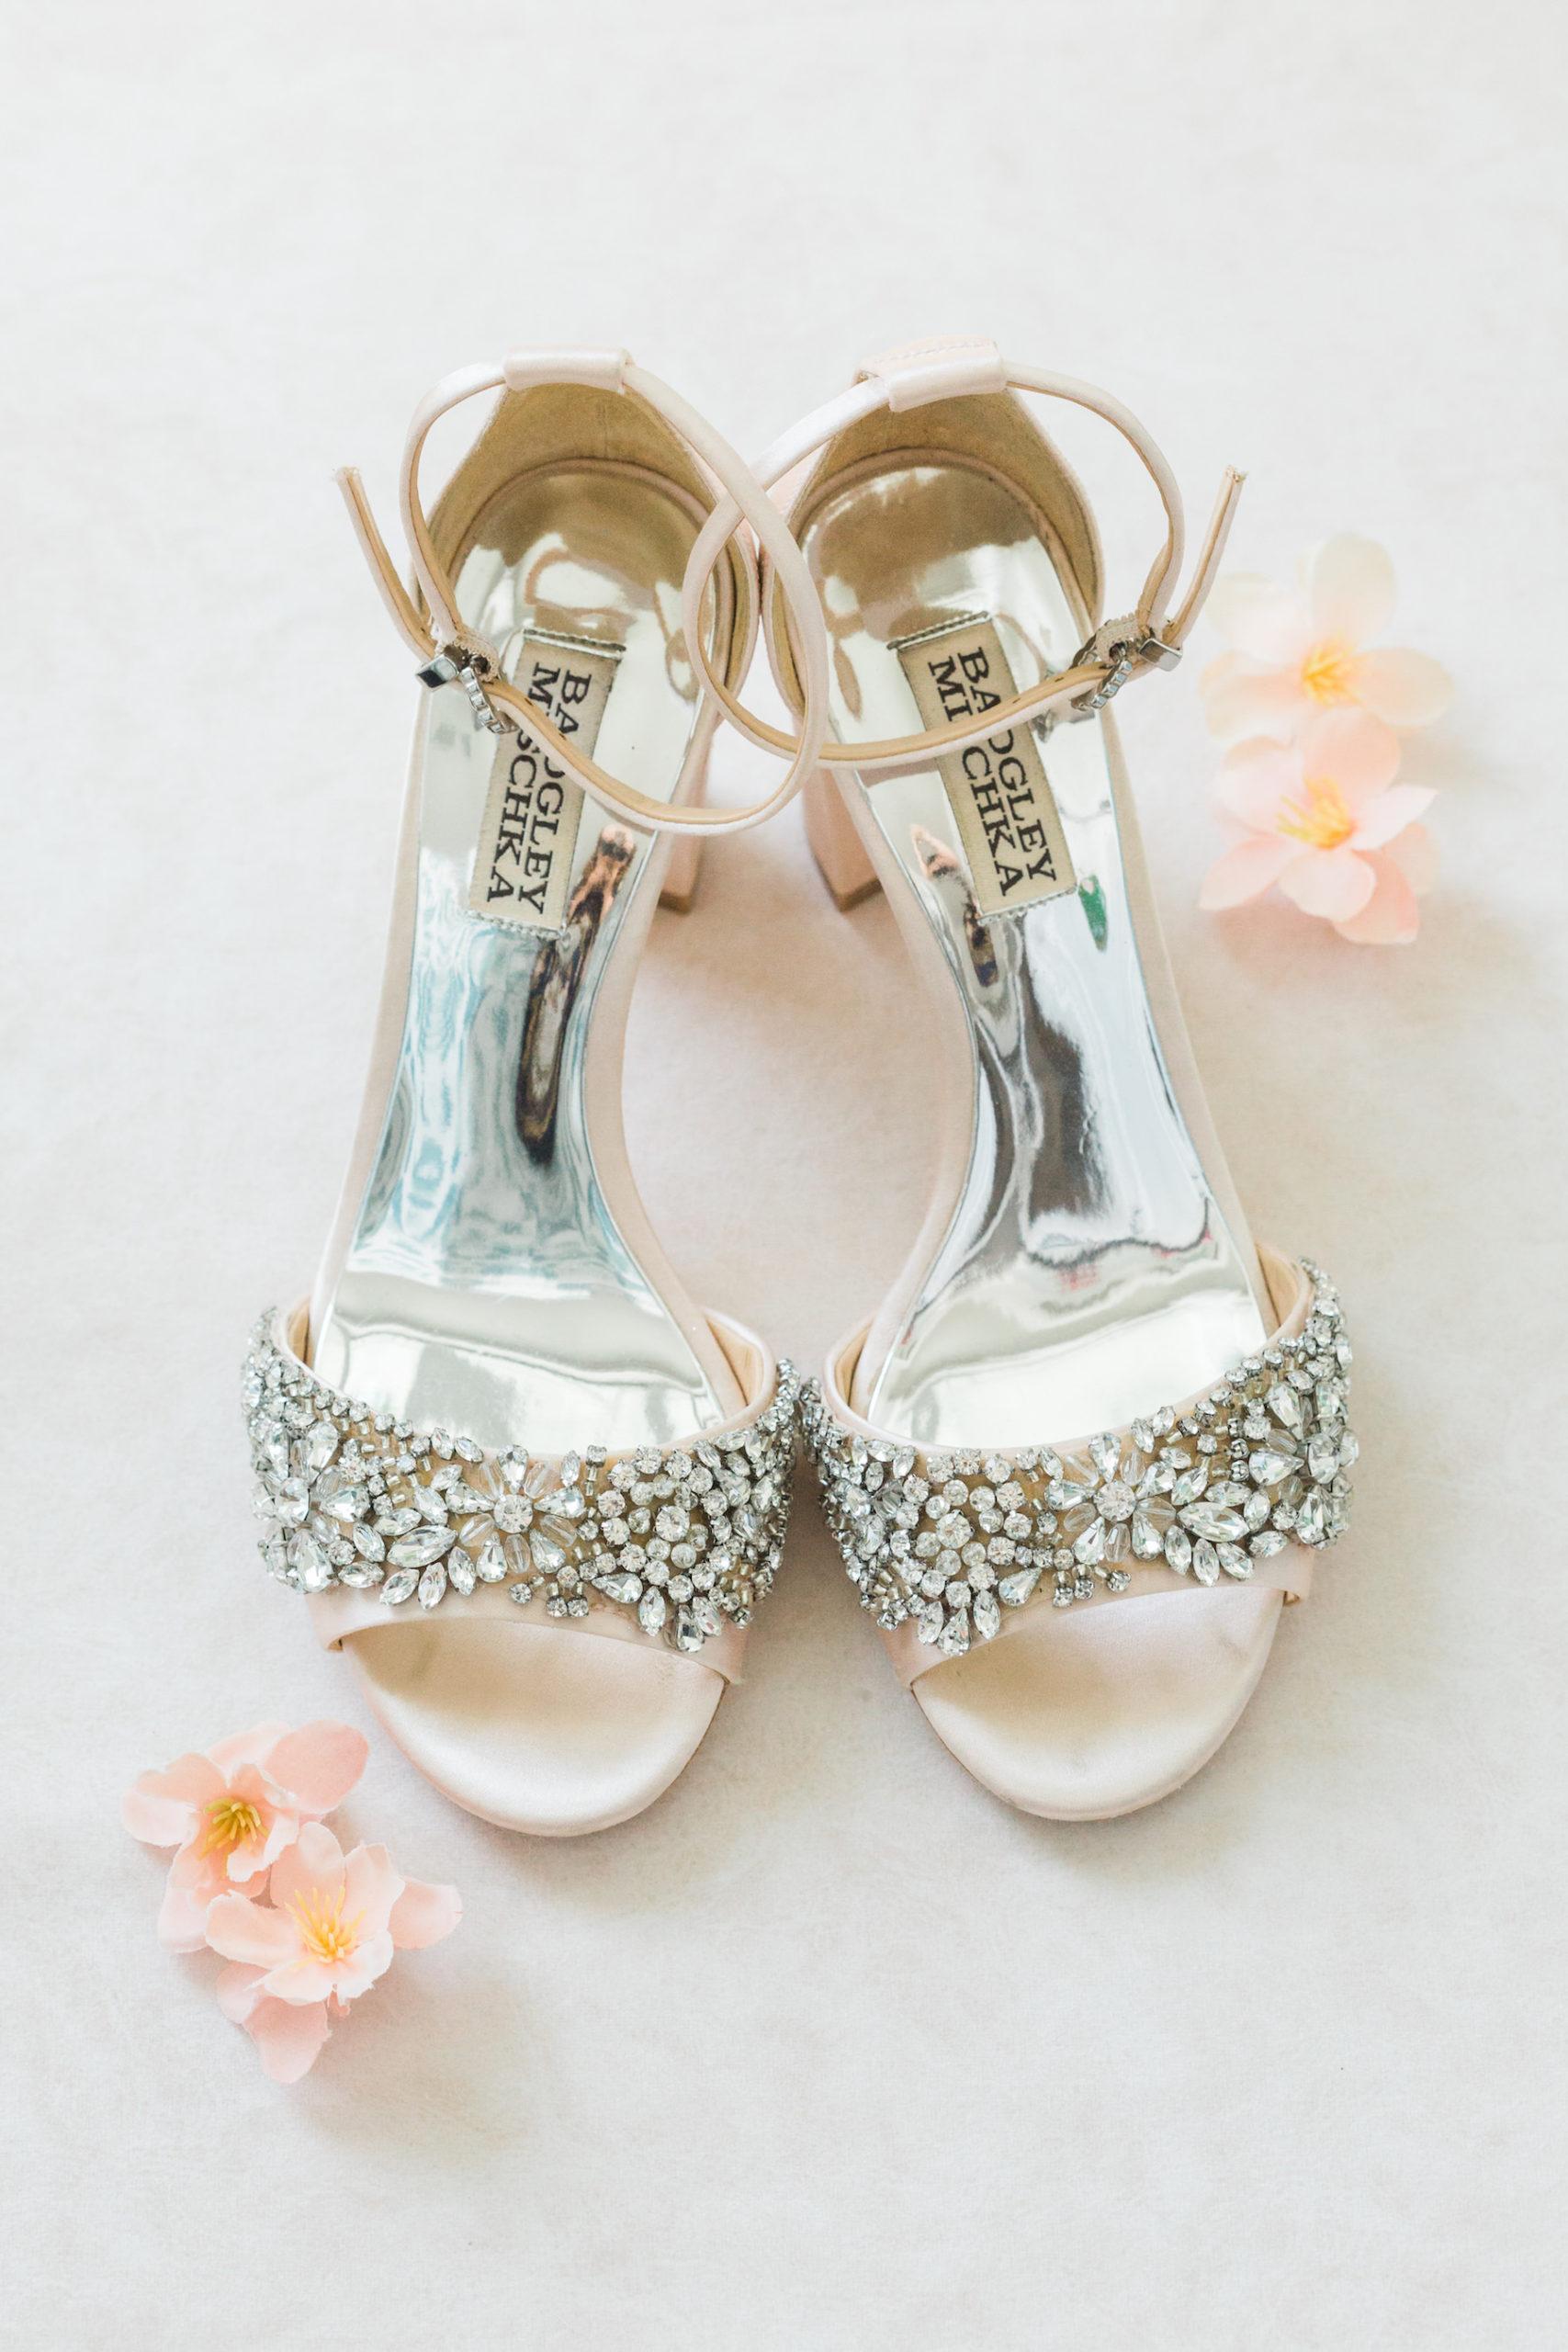 Open Toed Badgley Mischka Rhinestone Wedding Shoes